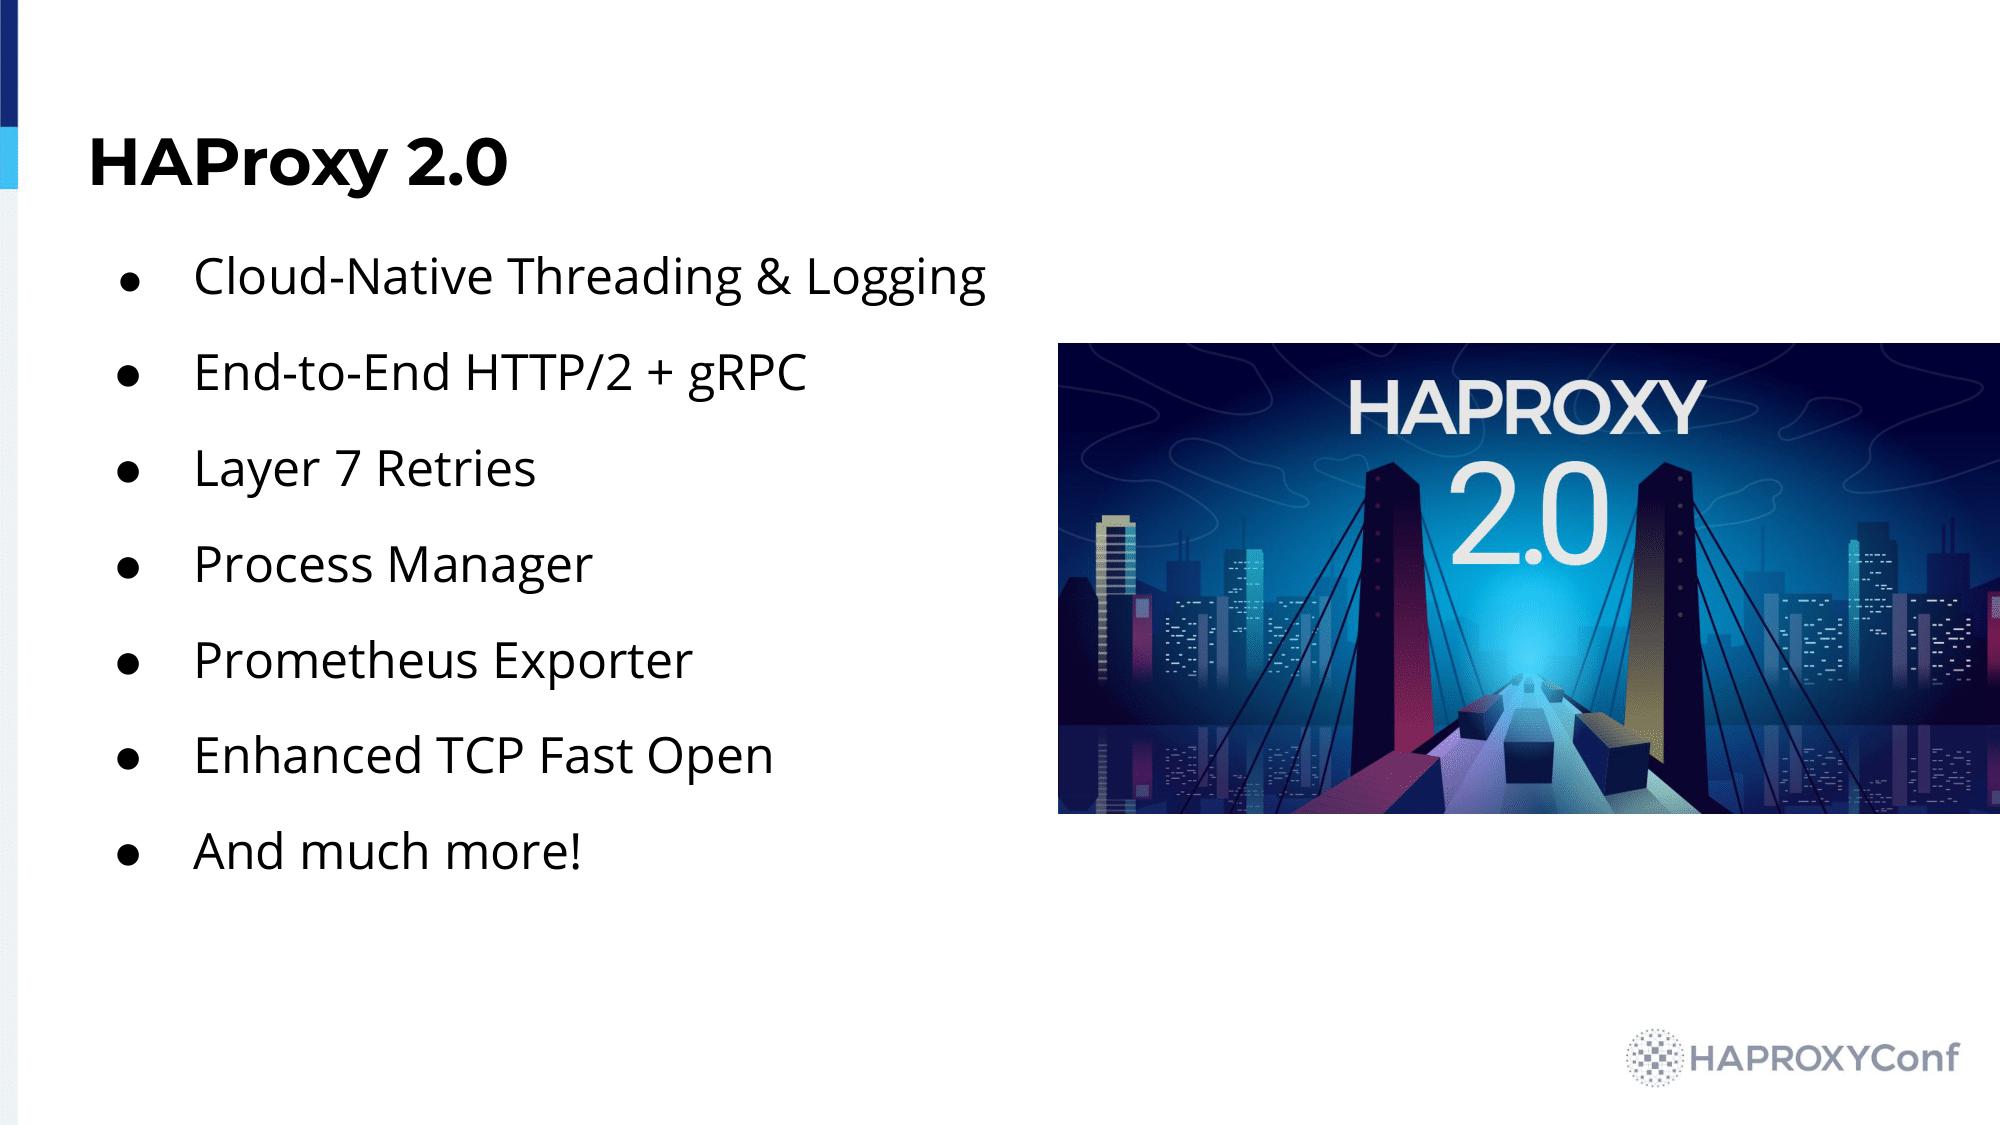 haproxyconf2019_keynote_daniel corbett_2